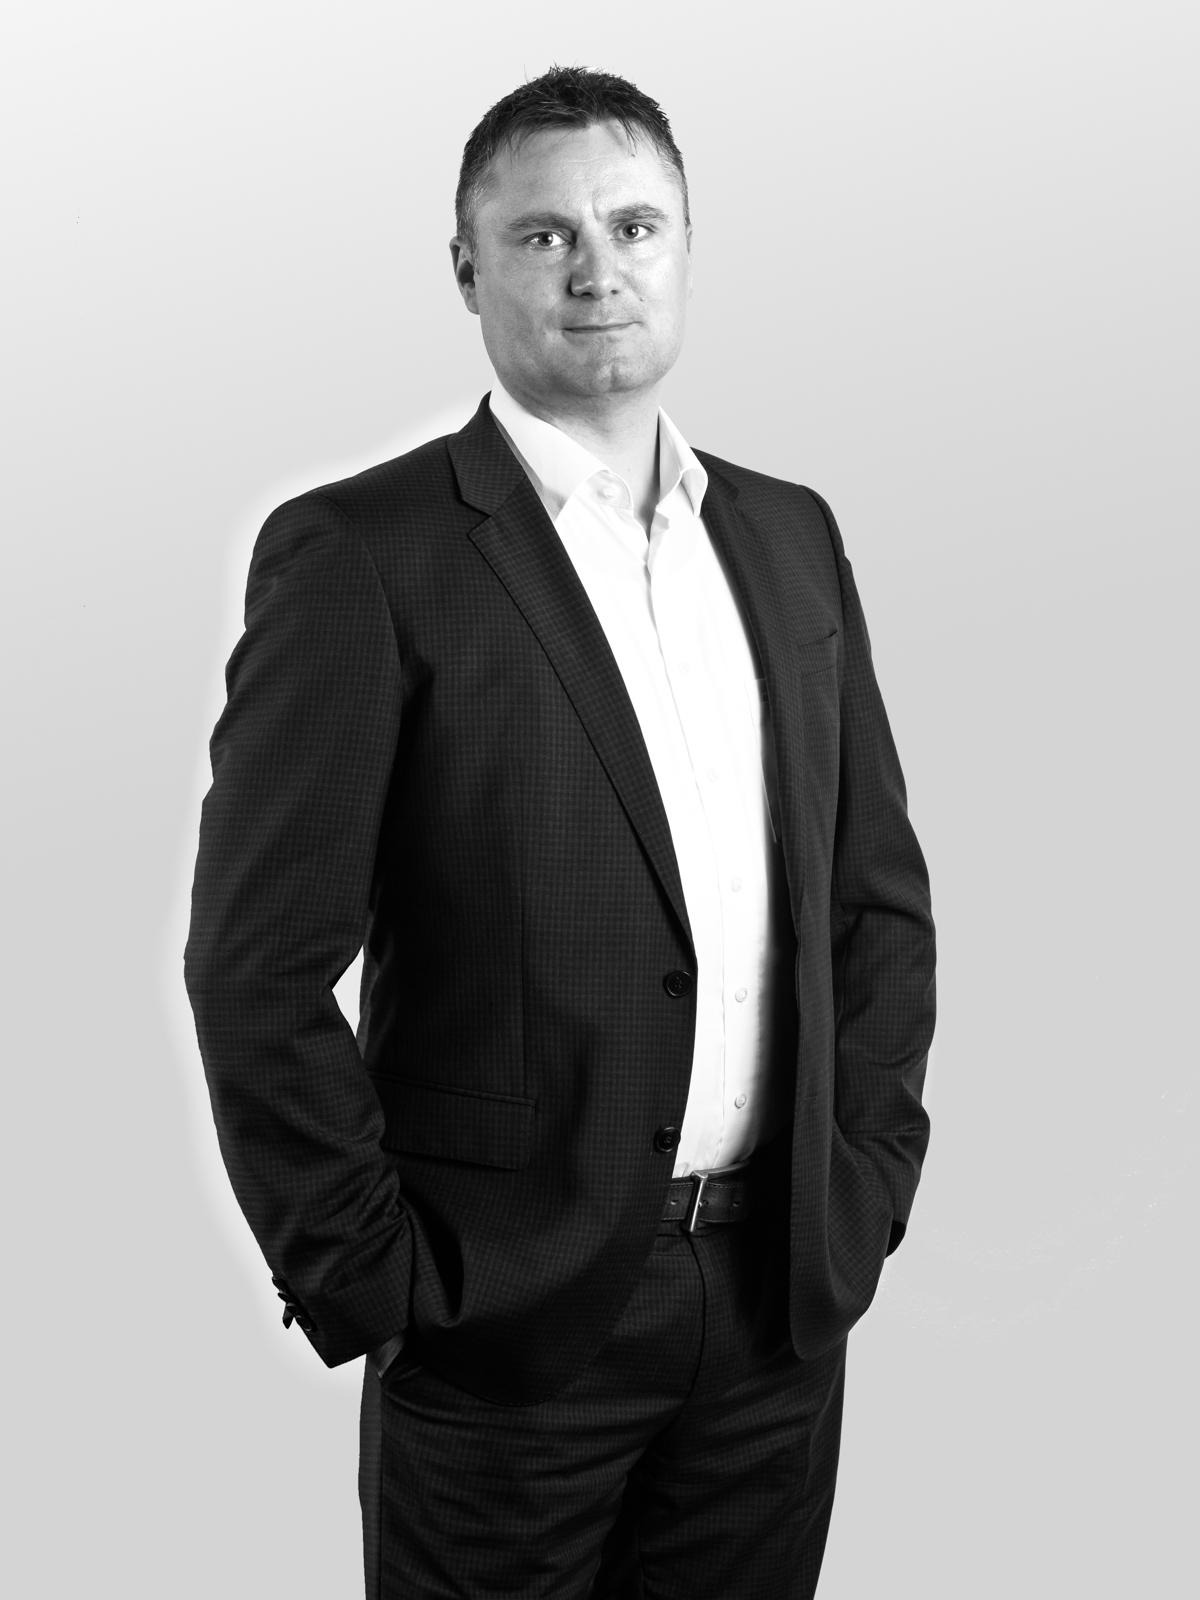 Jens Christian Jensen